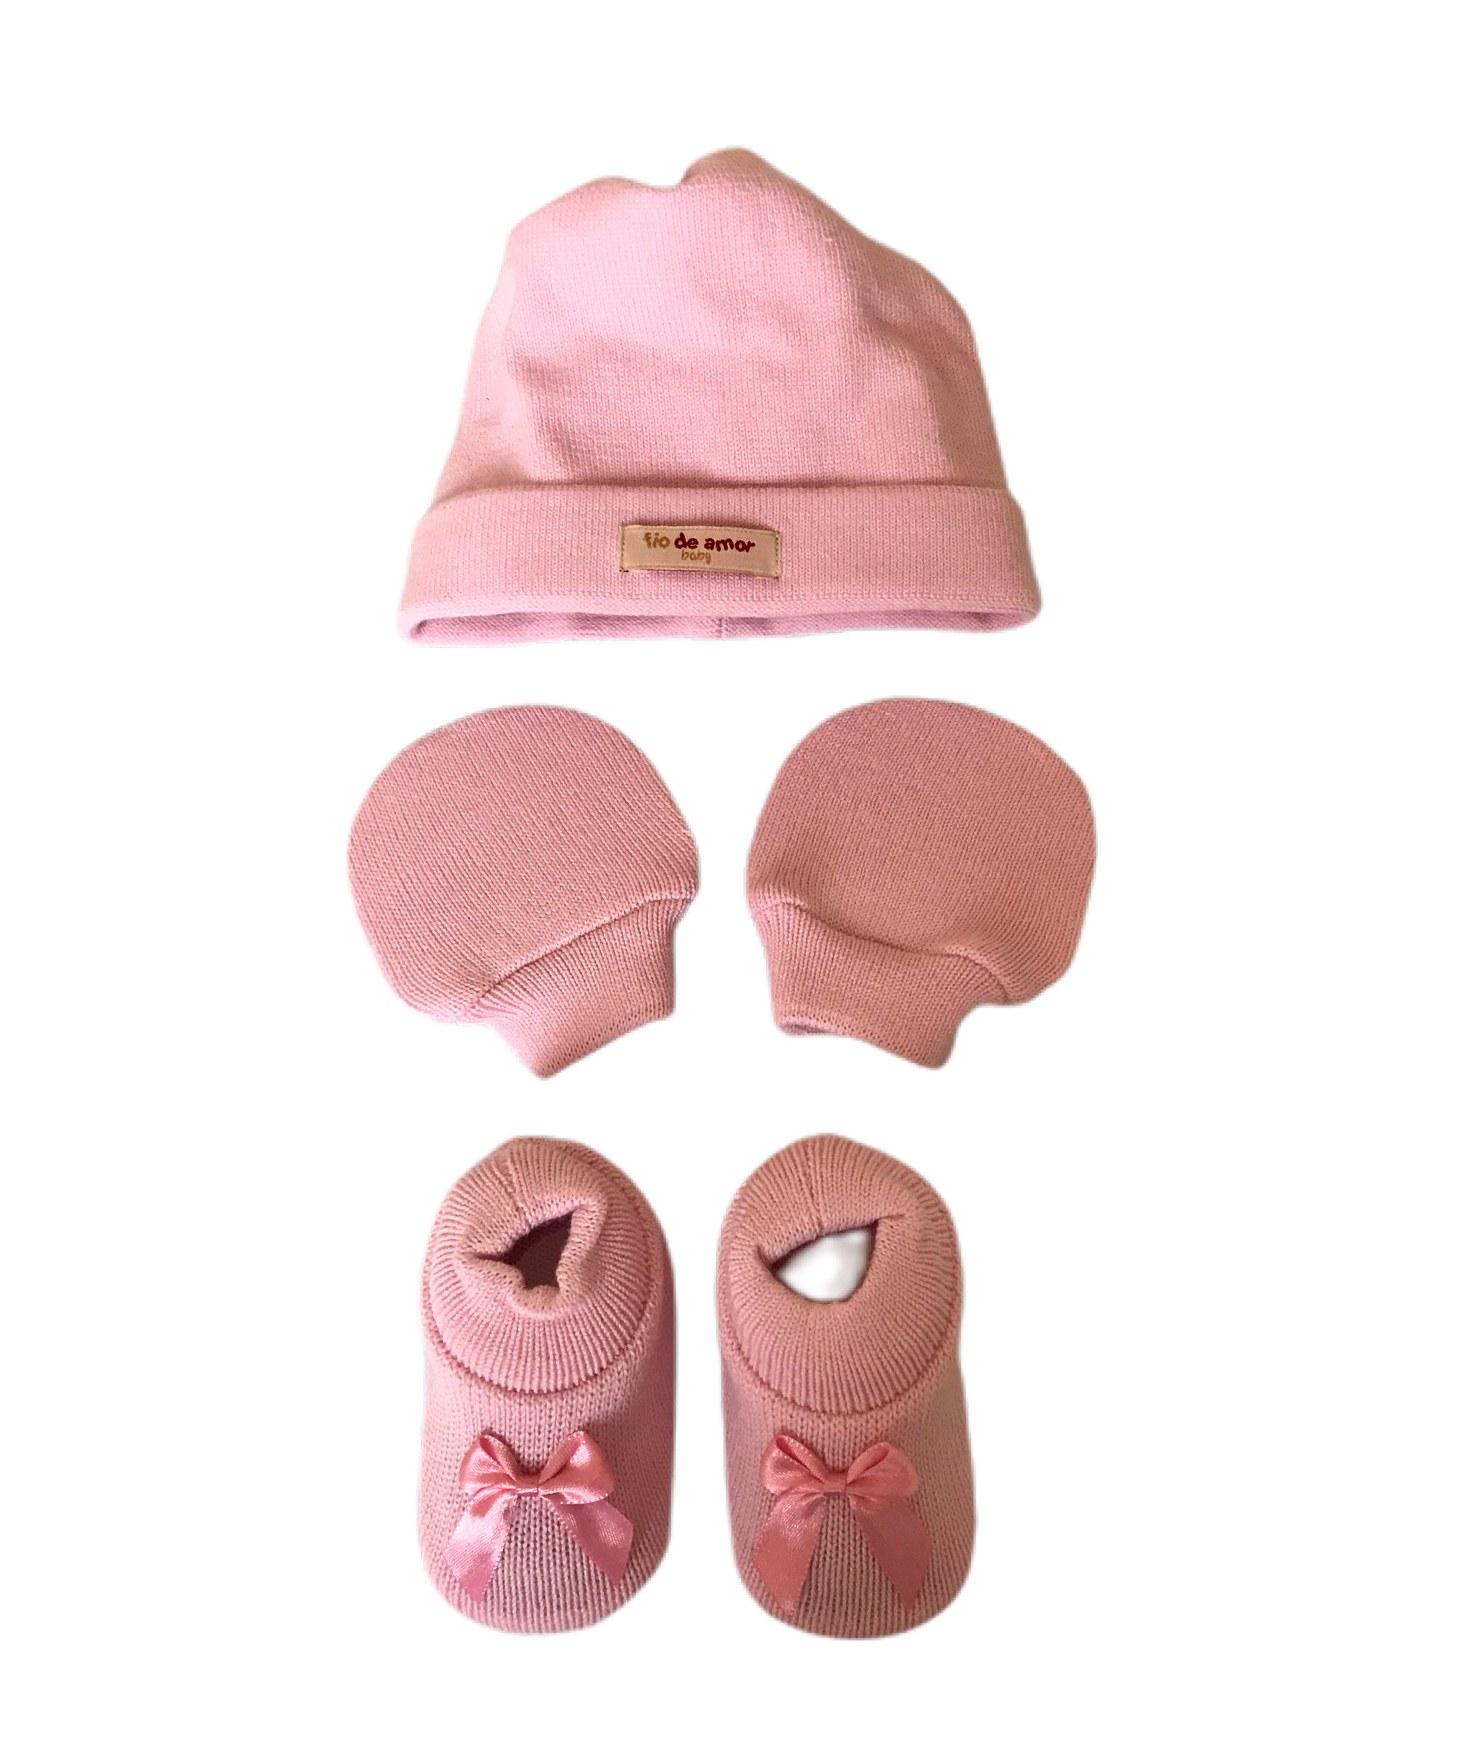 Kit Sapatinho + Luva + Touca de Tricot Rosa Bebê Fio de Amor Baby